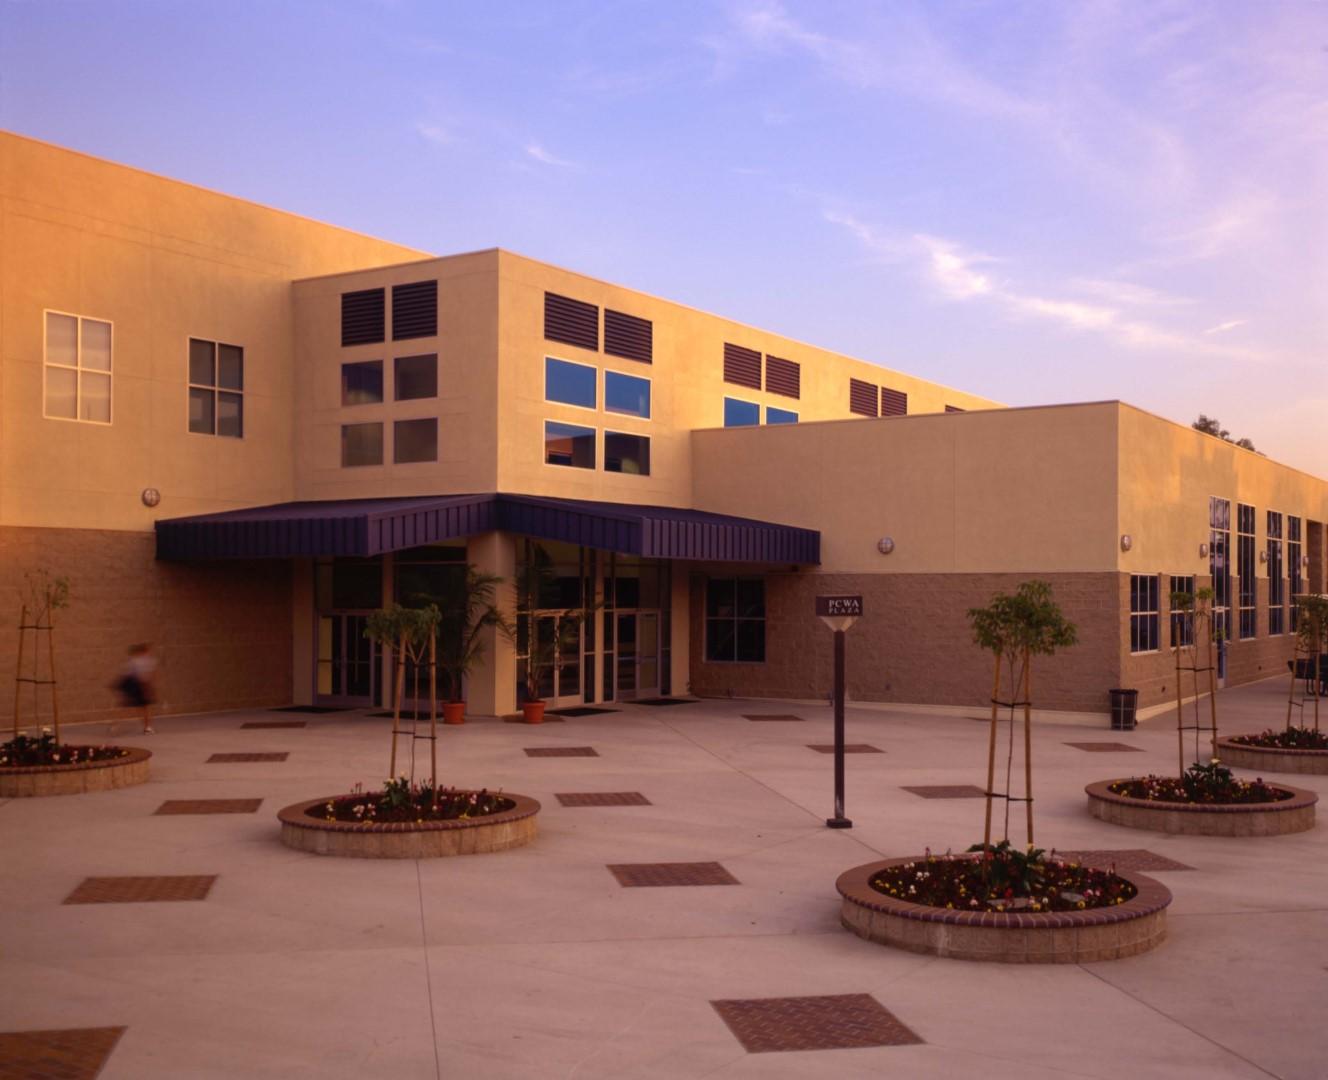 2 Hope International University, Gymnasium_Student Center (Exterior Day), Fullerton, CA